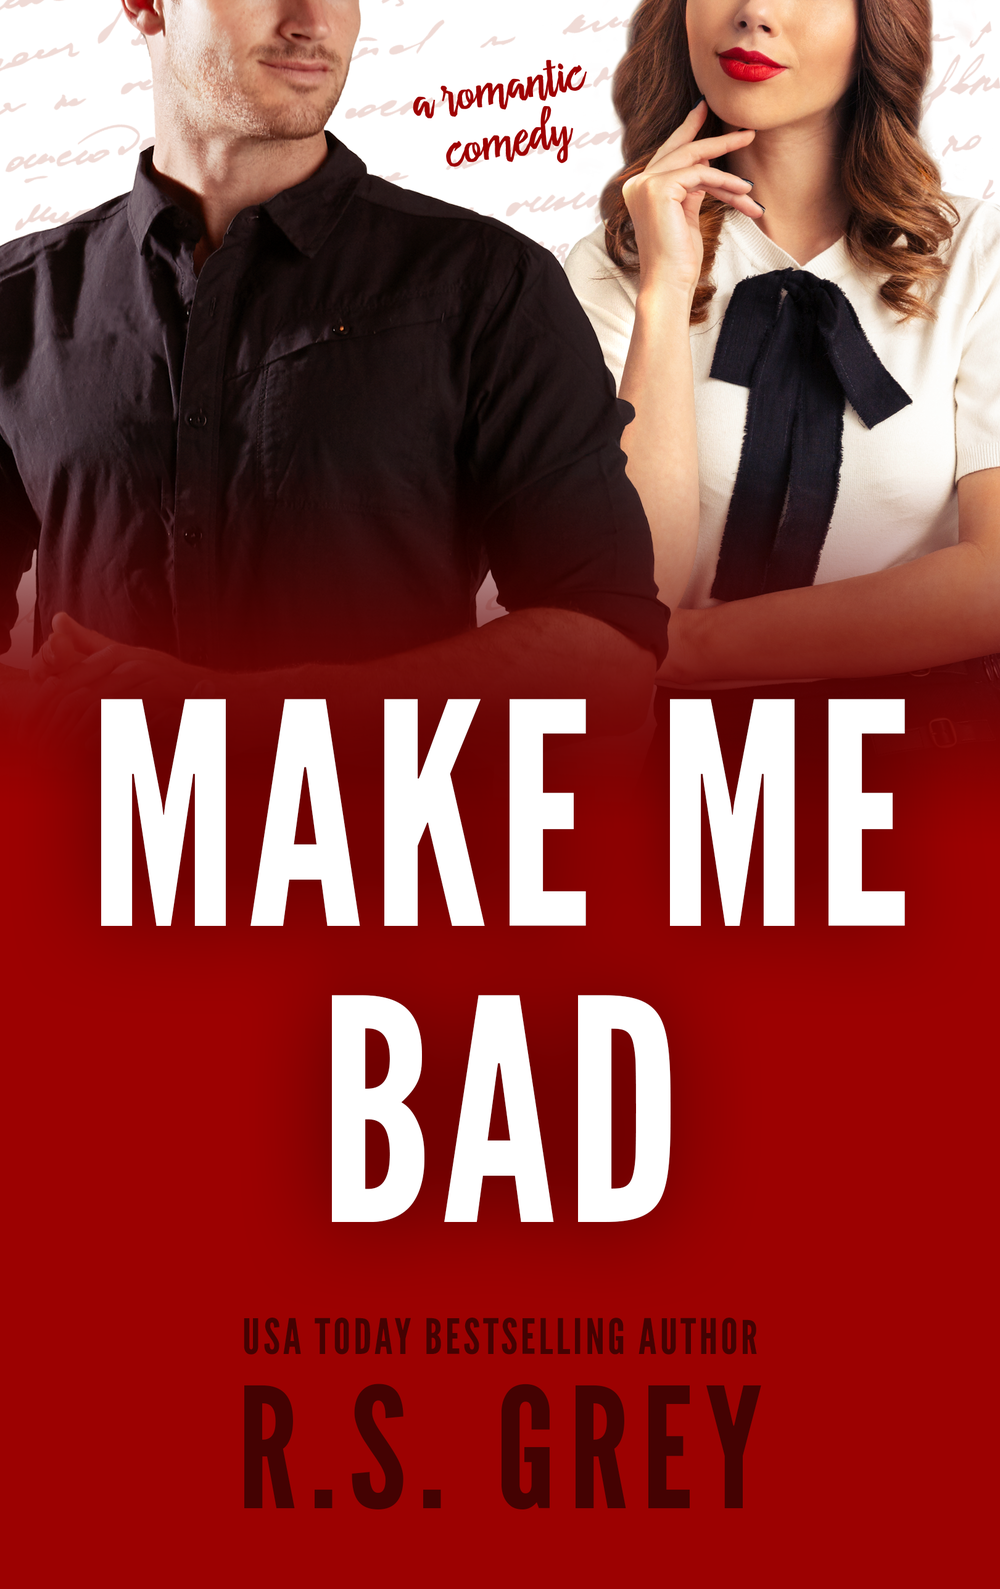 MakeMeBadEbookCover.png